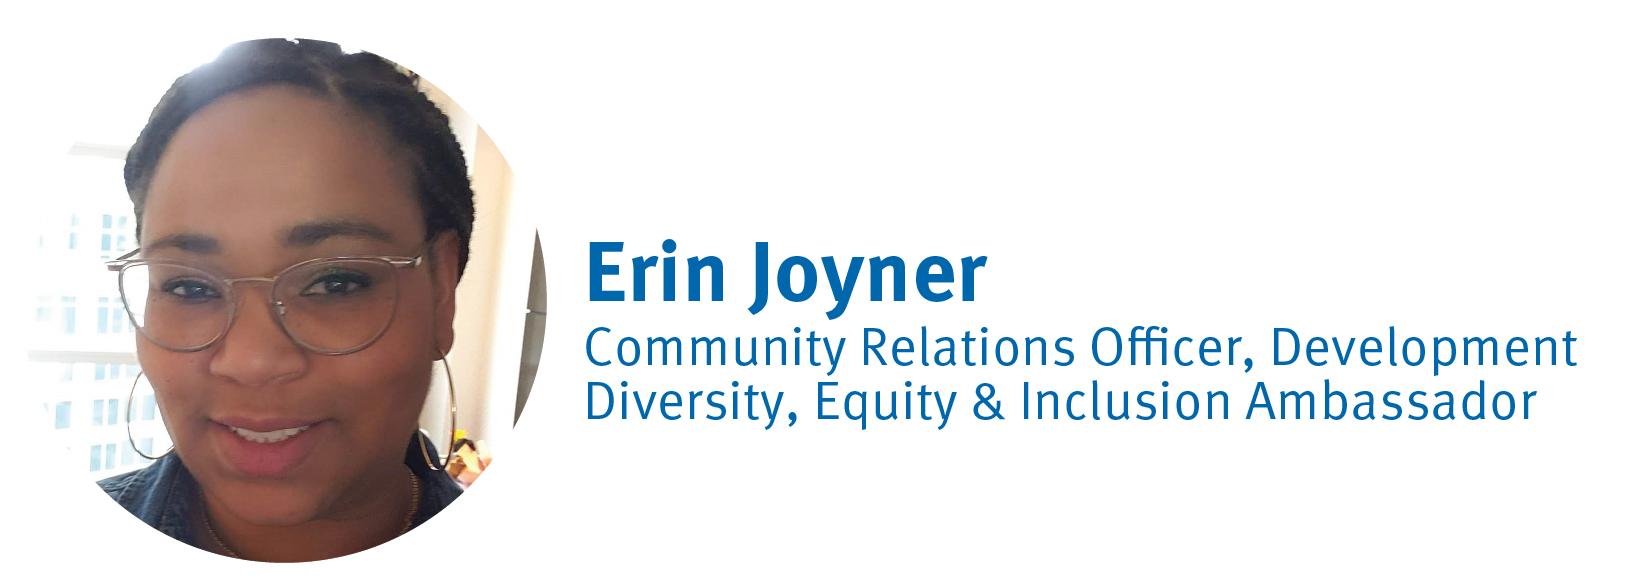 Erin Joyner, DE&I Ambassador